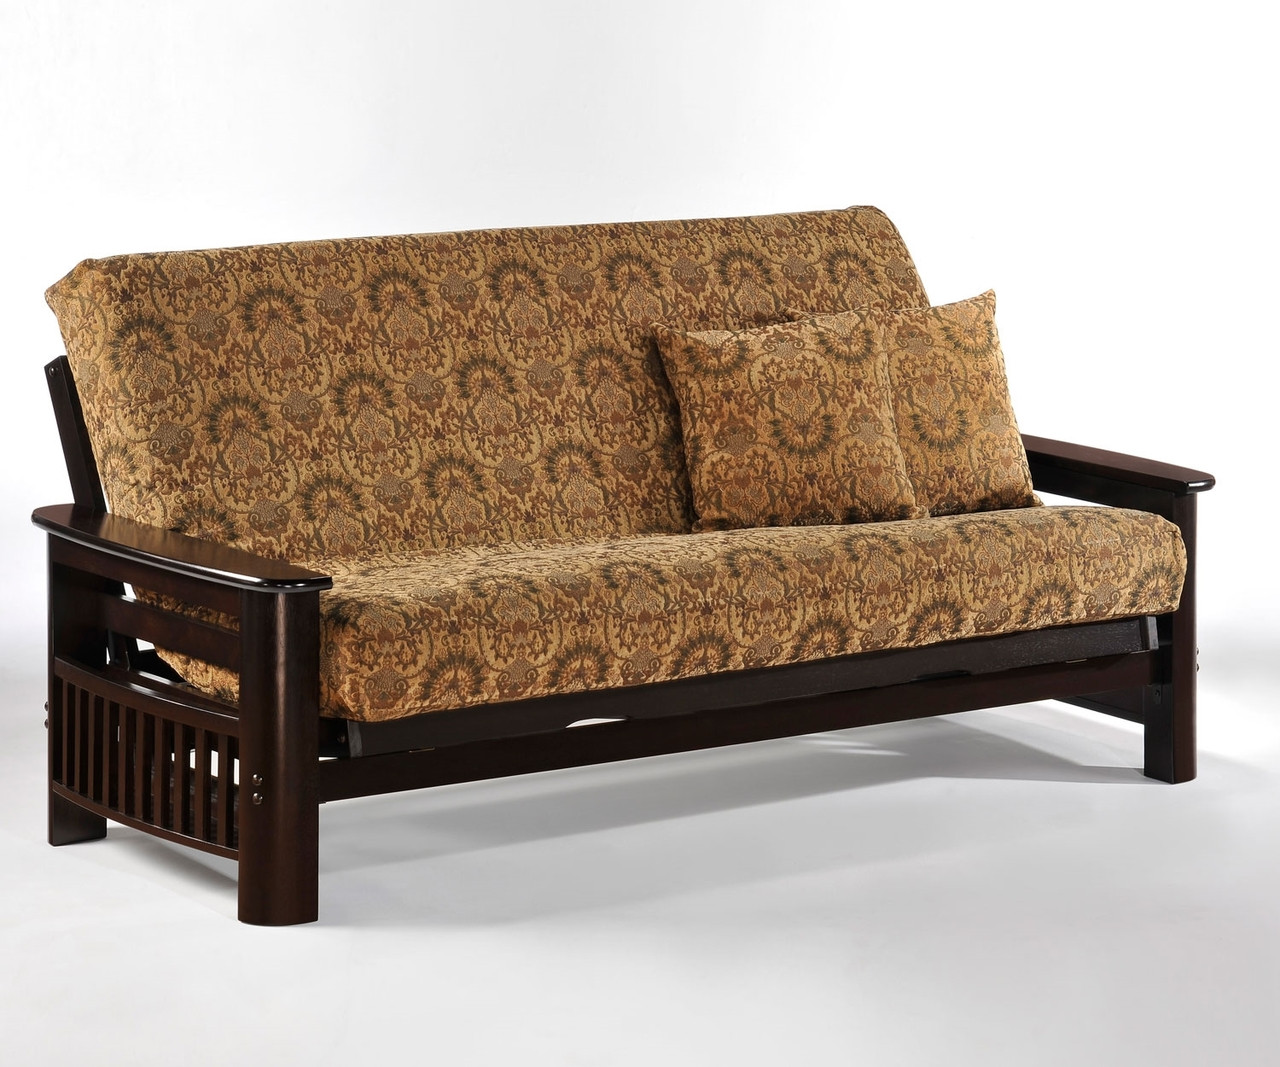 Bon Portofino Futon Sofa Chocolate   Night And Day Furniture   ND Portofino CHO